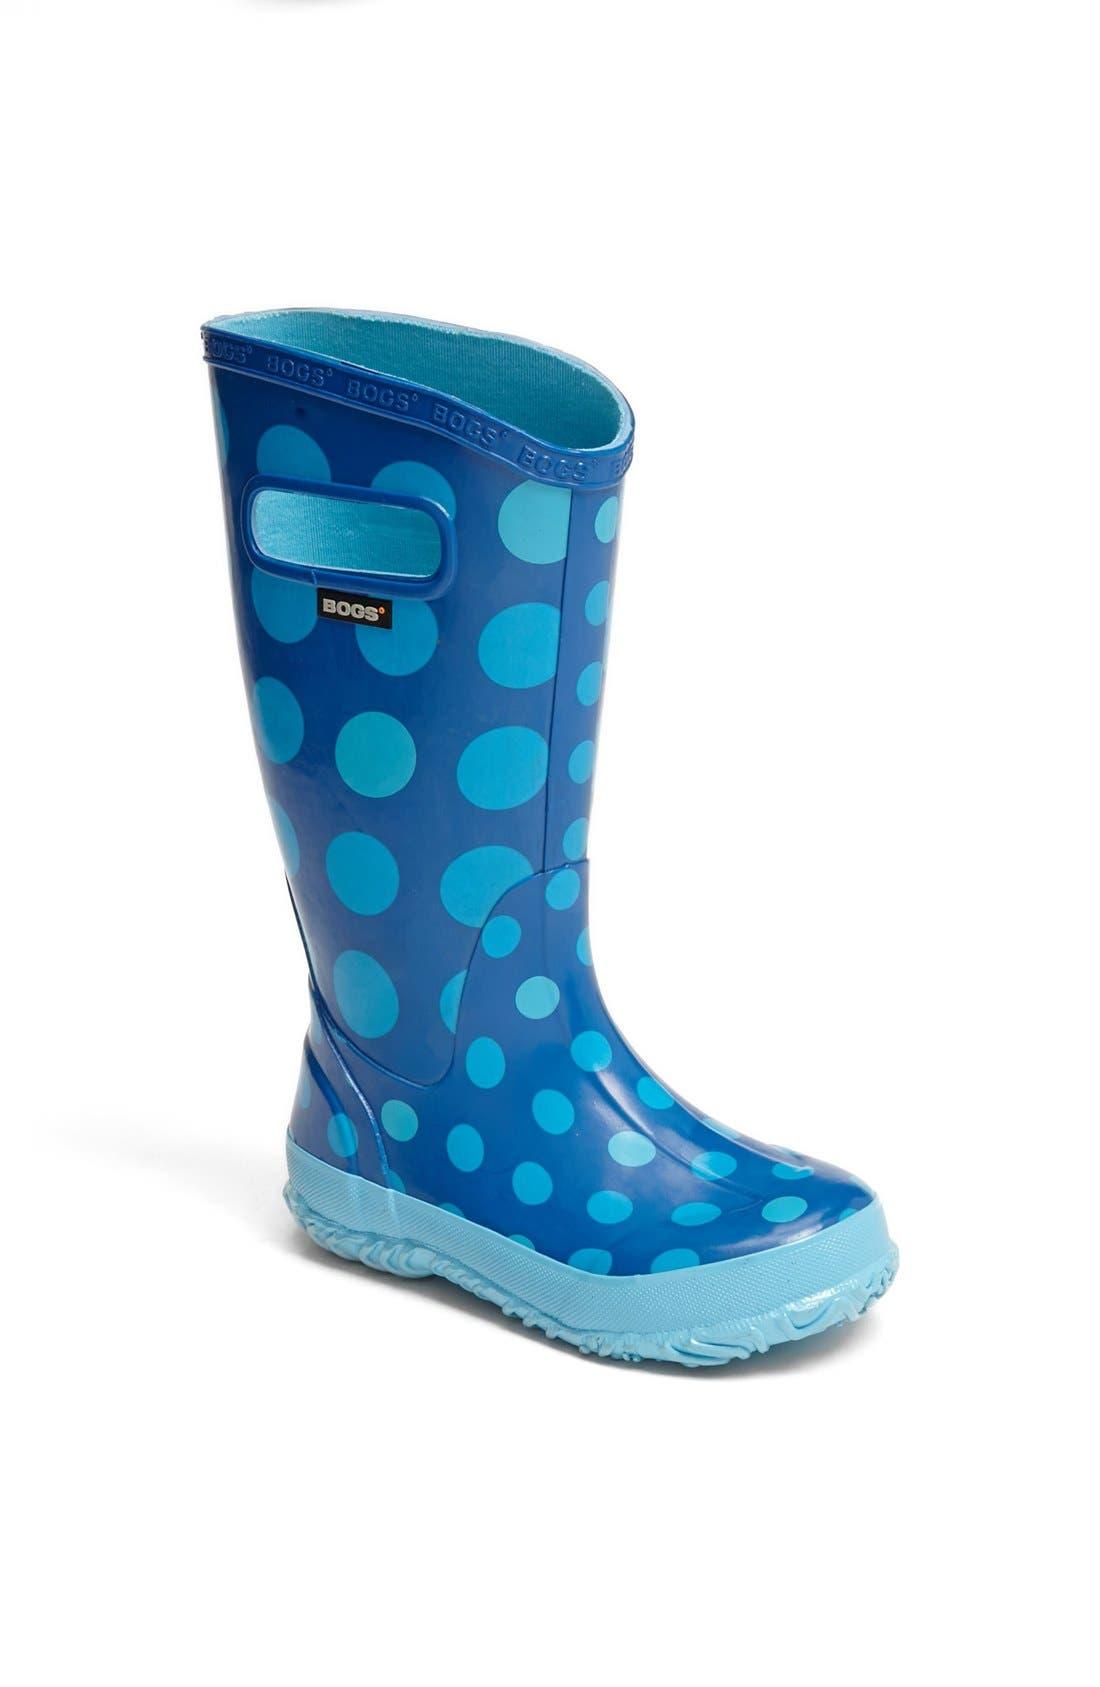 Alternate Image 1 Selected - Bogs 'Dots' Rain Boot (Walker, Toddler, Little Kid & Big Kid)